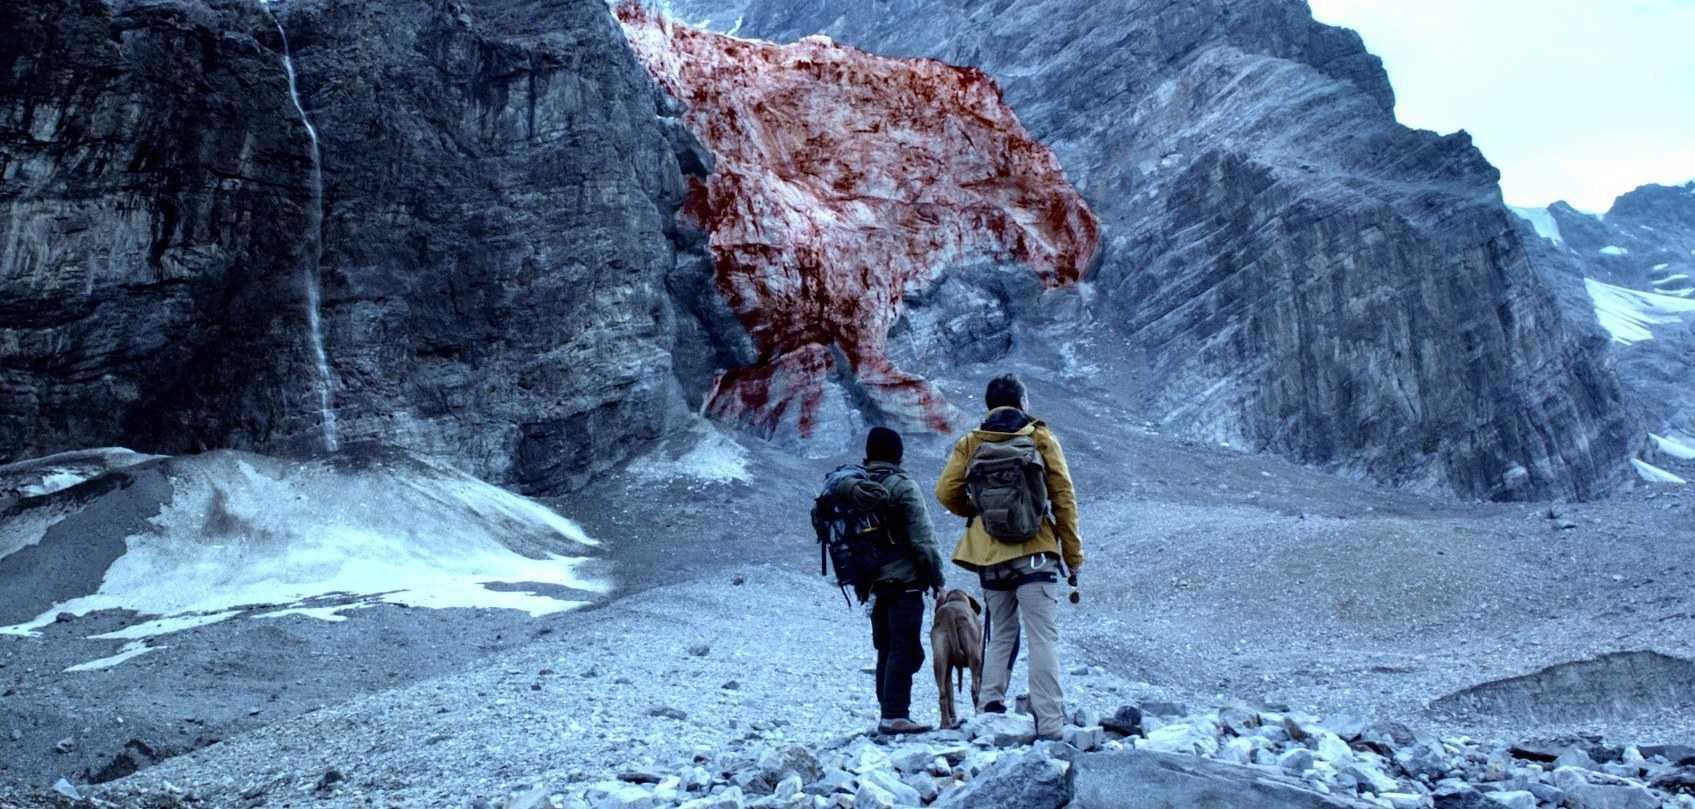 Confronting the Blood Glacier (2013)